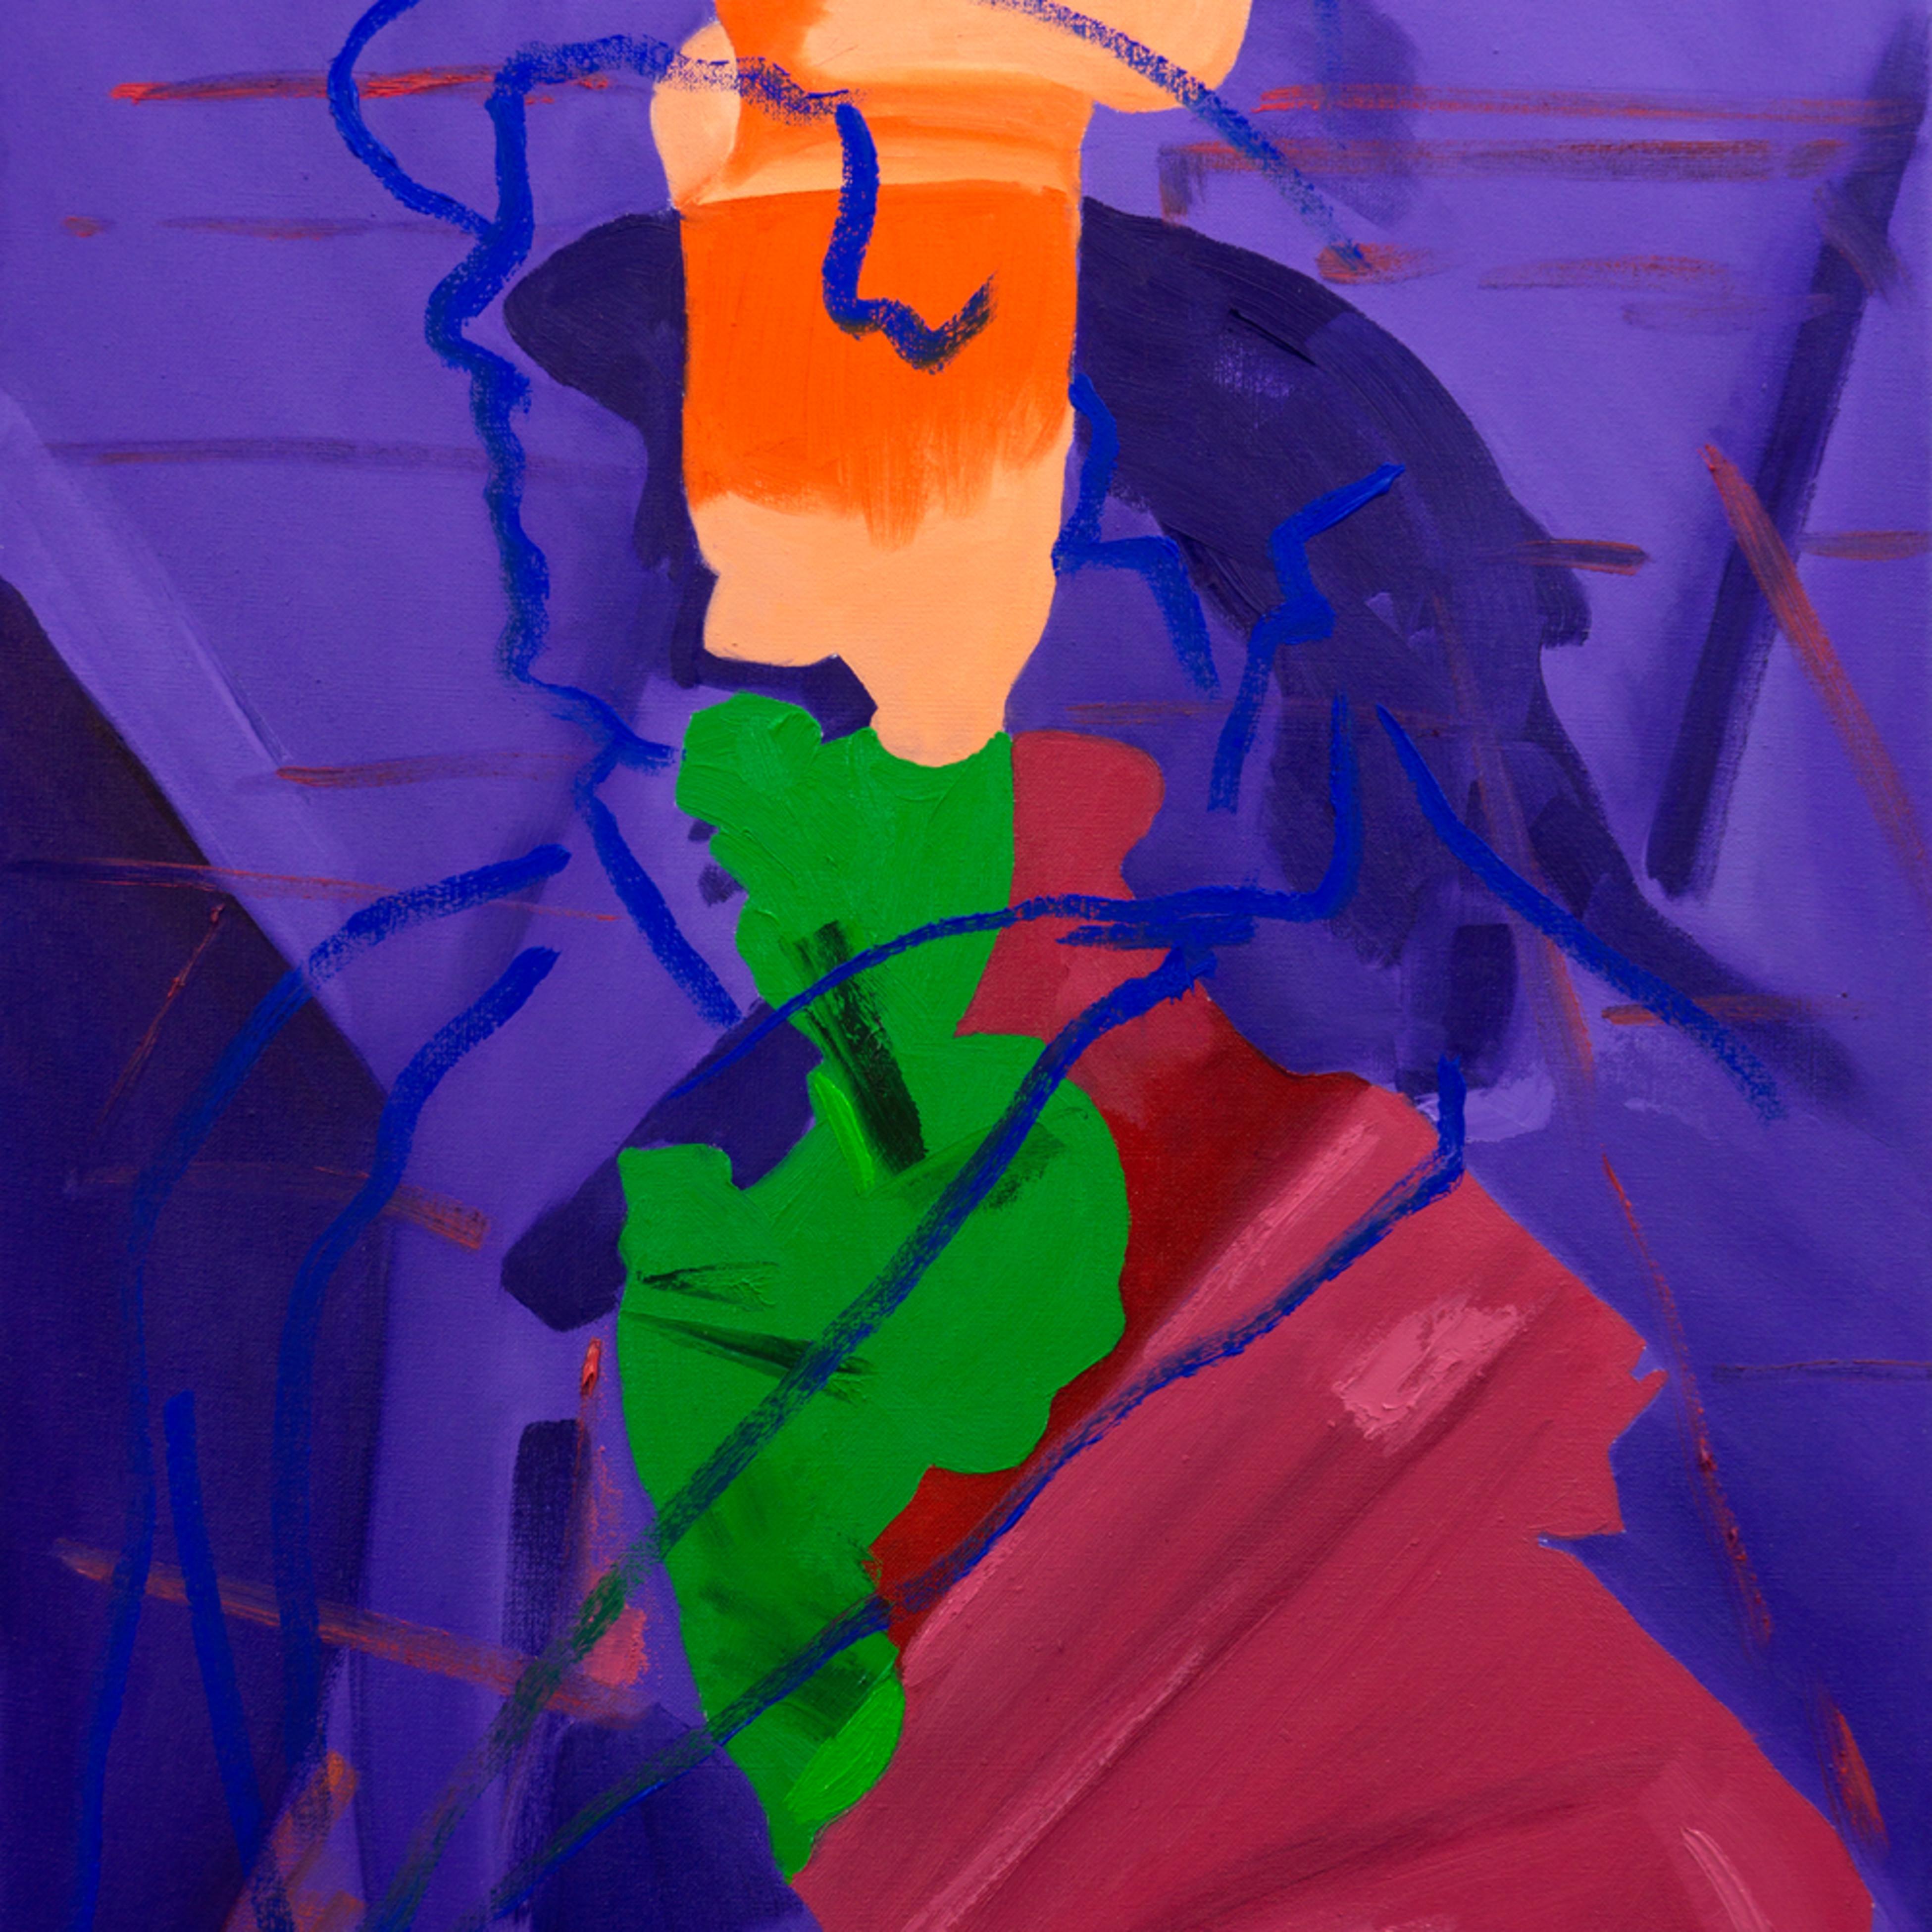 Stuart bush 2020 play his base desires oil on canvas 50.2 x 70.3 x 3.3 cm 2020 goxsrx